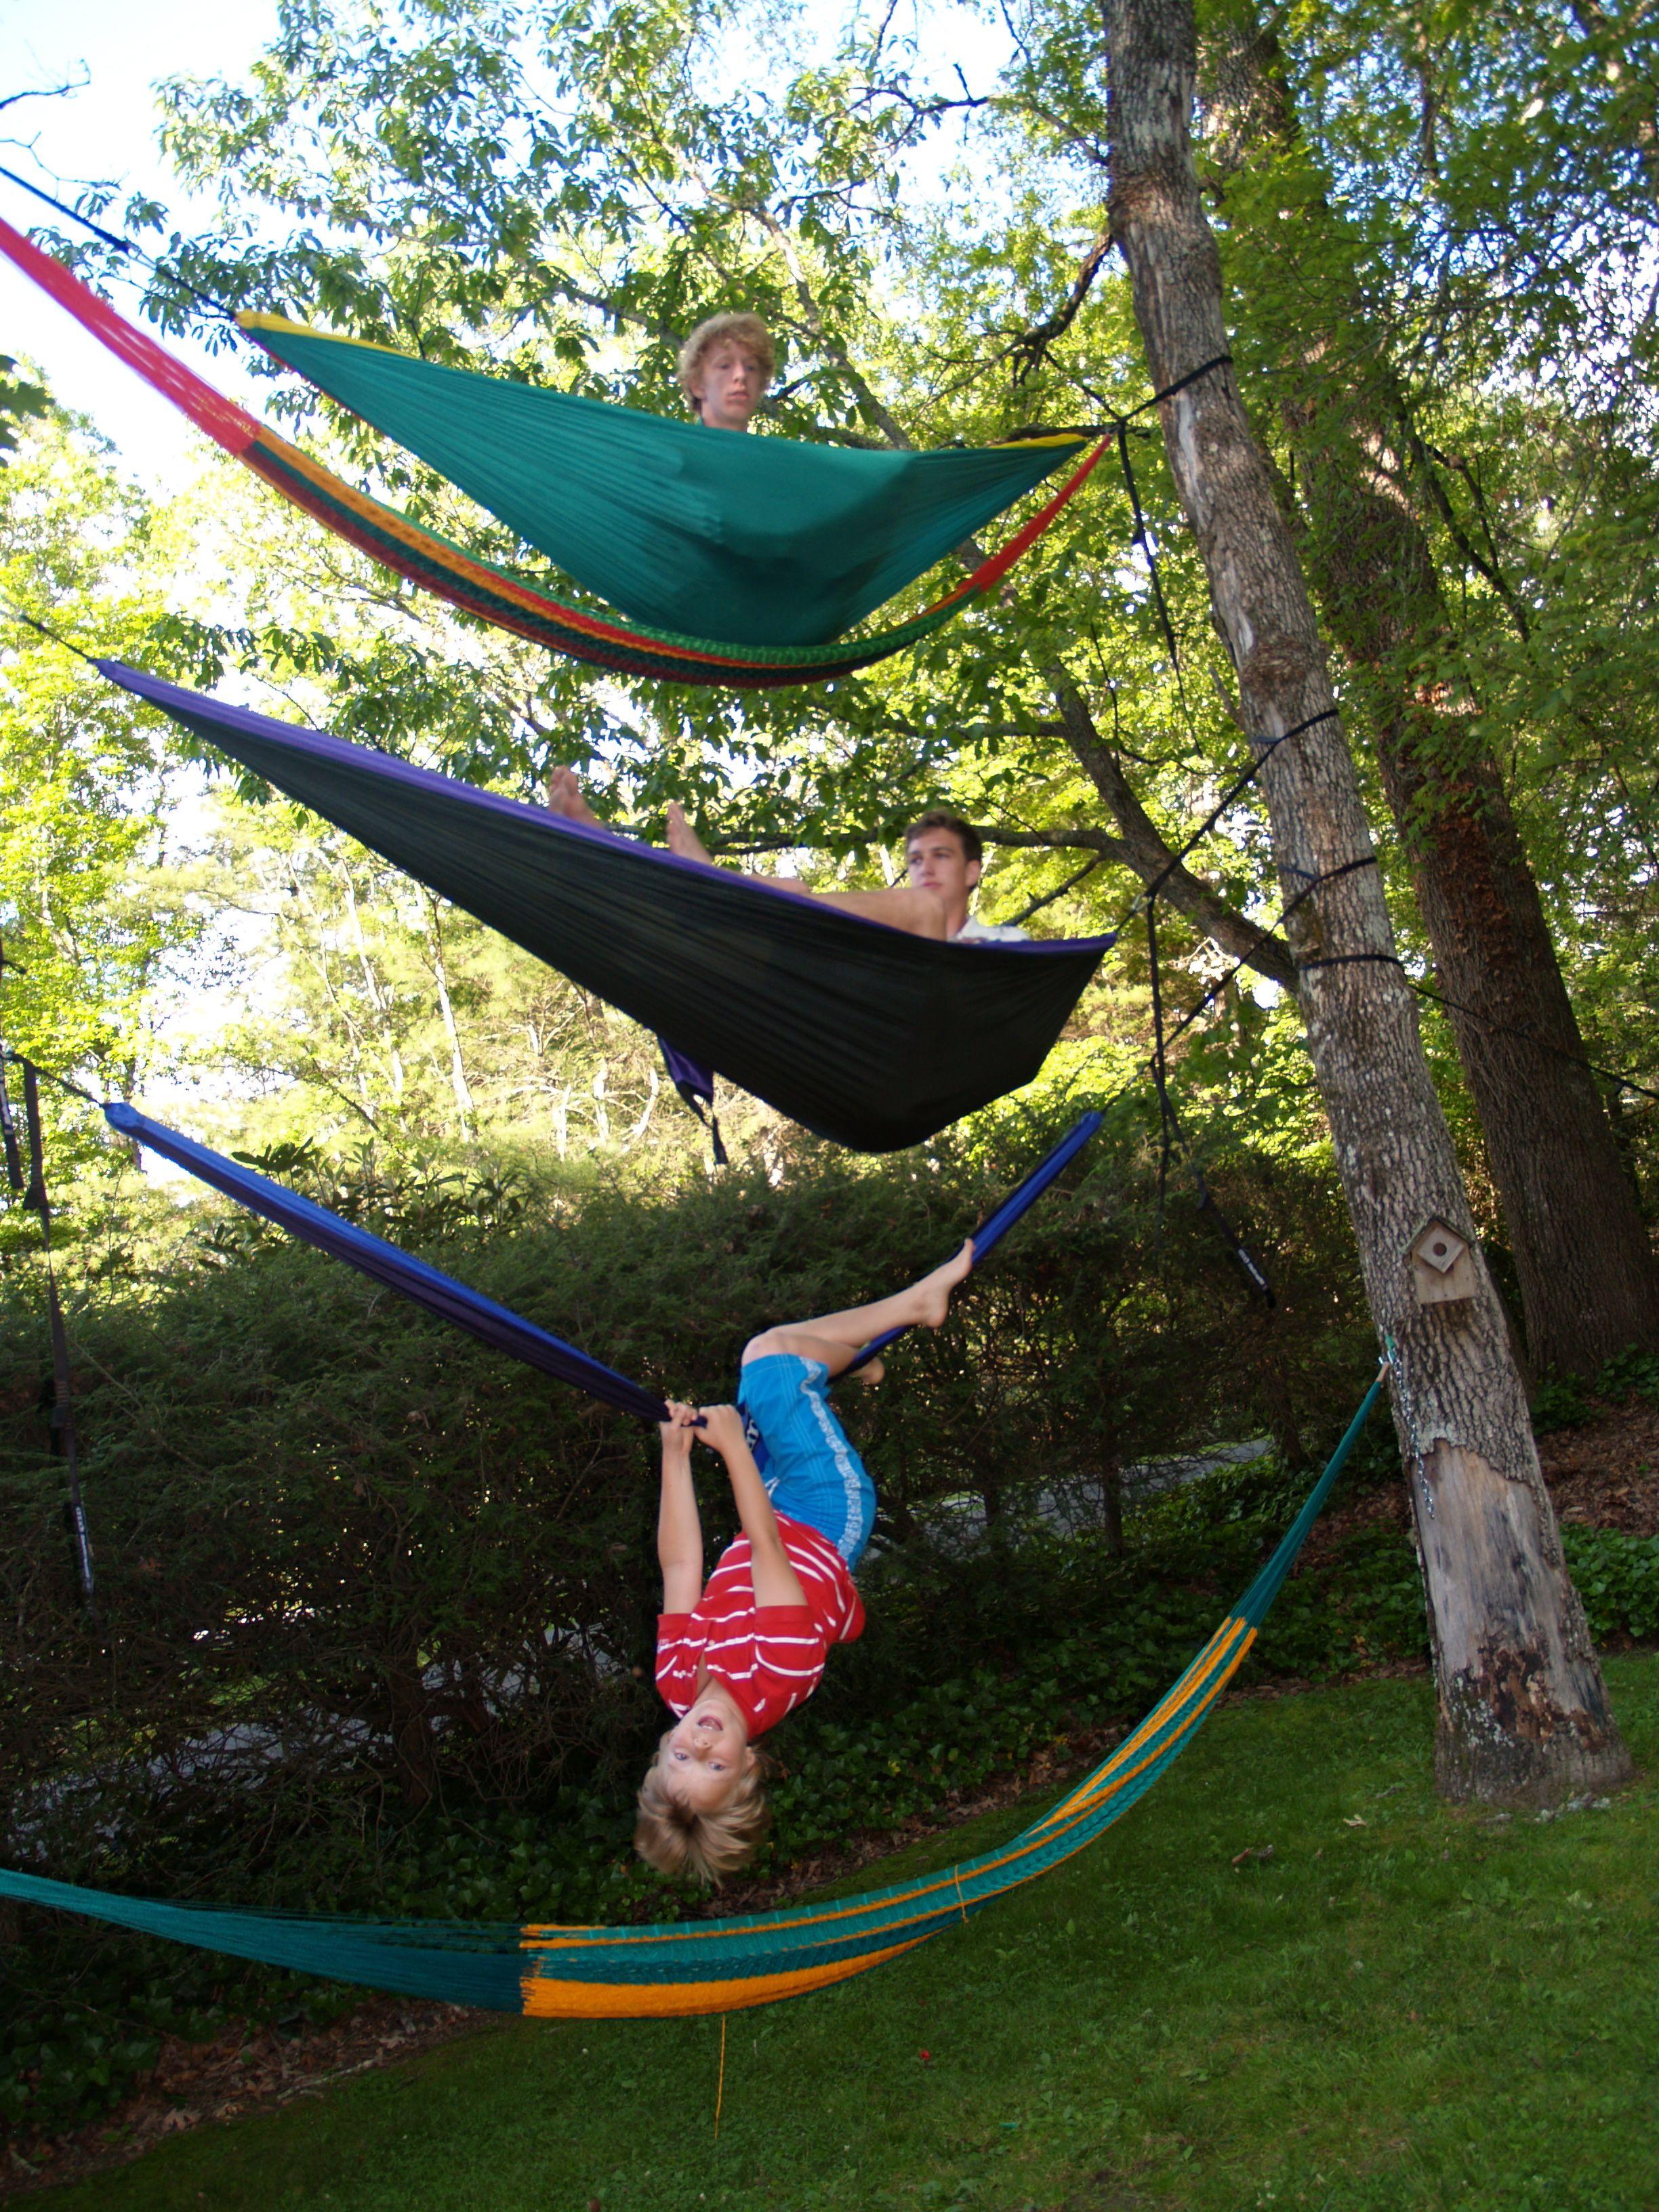 5 hammocks | Hanging hammock, Hammock, Outdoor decor